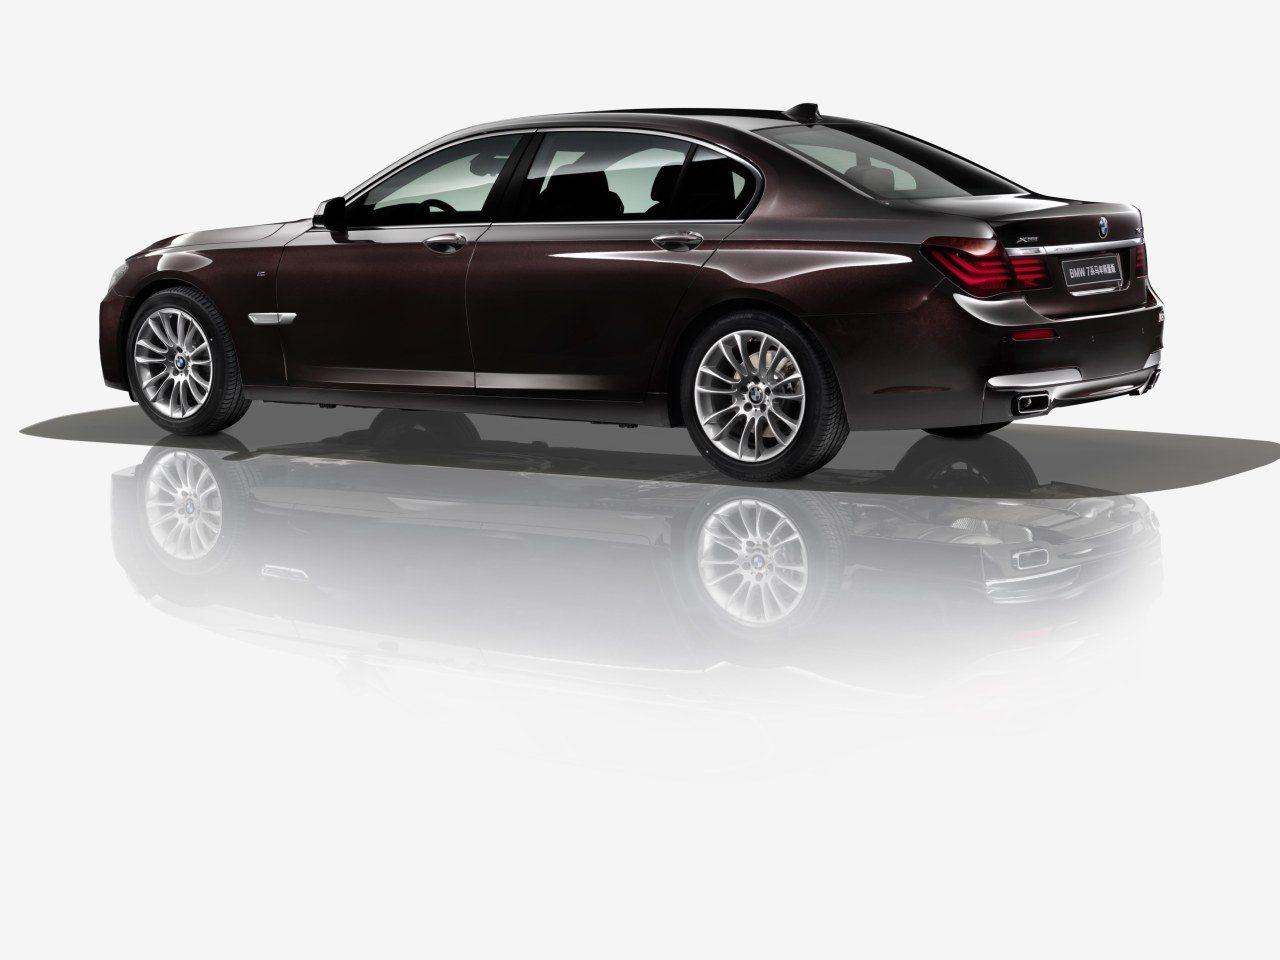 BMW-7-Serie-Horse-01.jpg